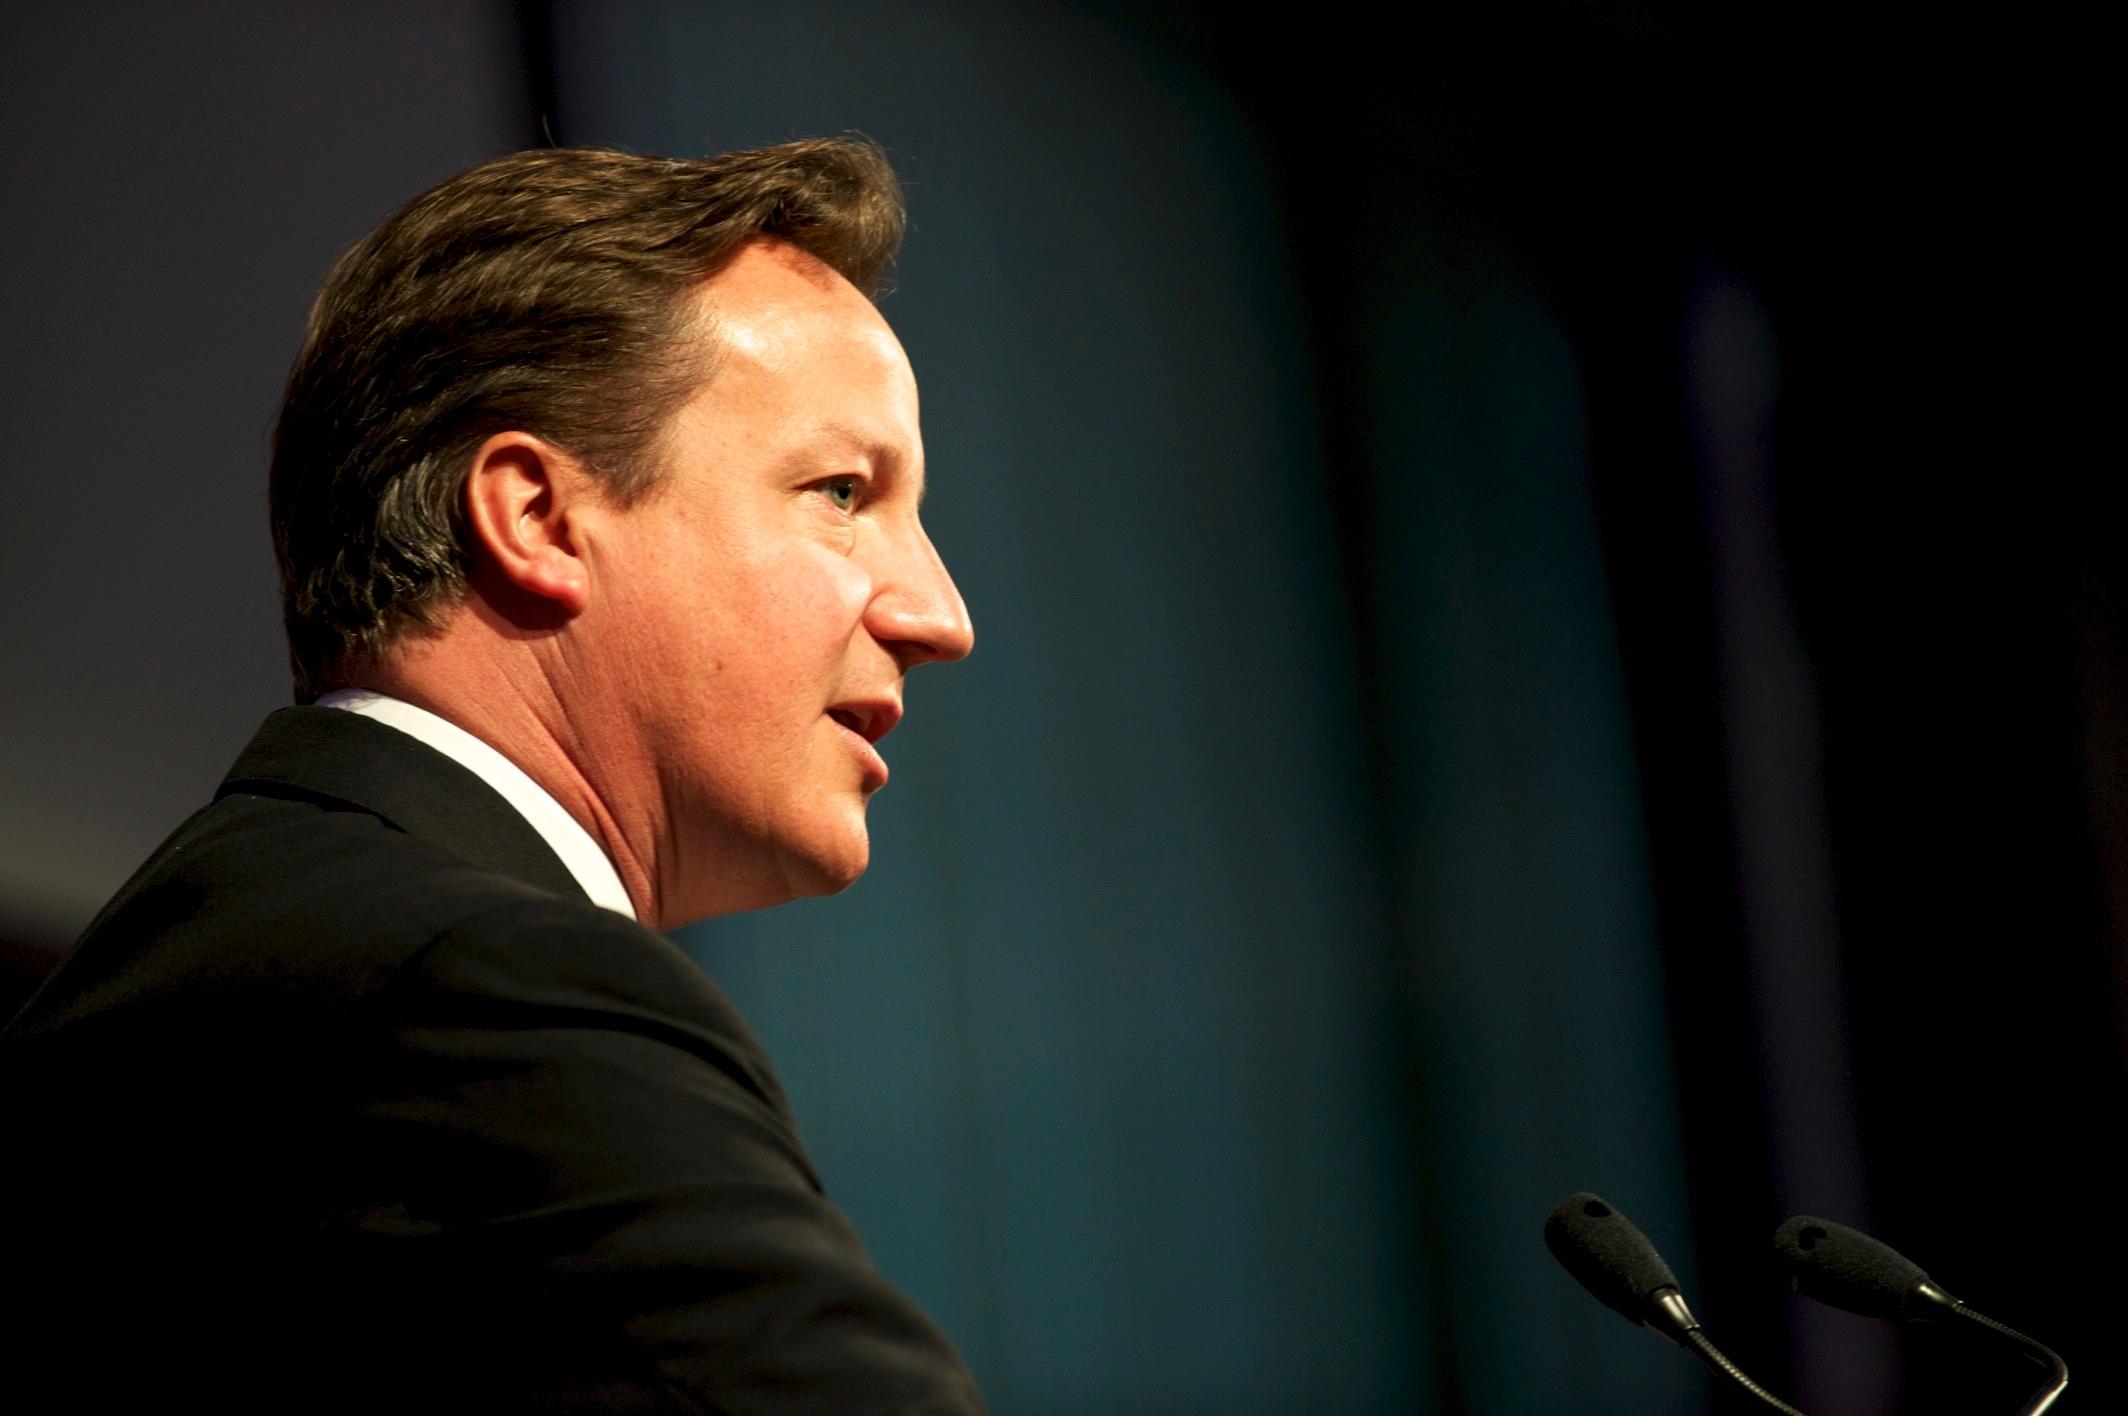 Prime Minister David Cameron,